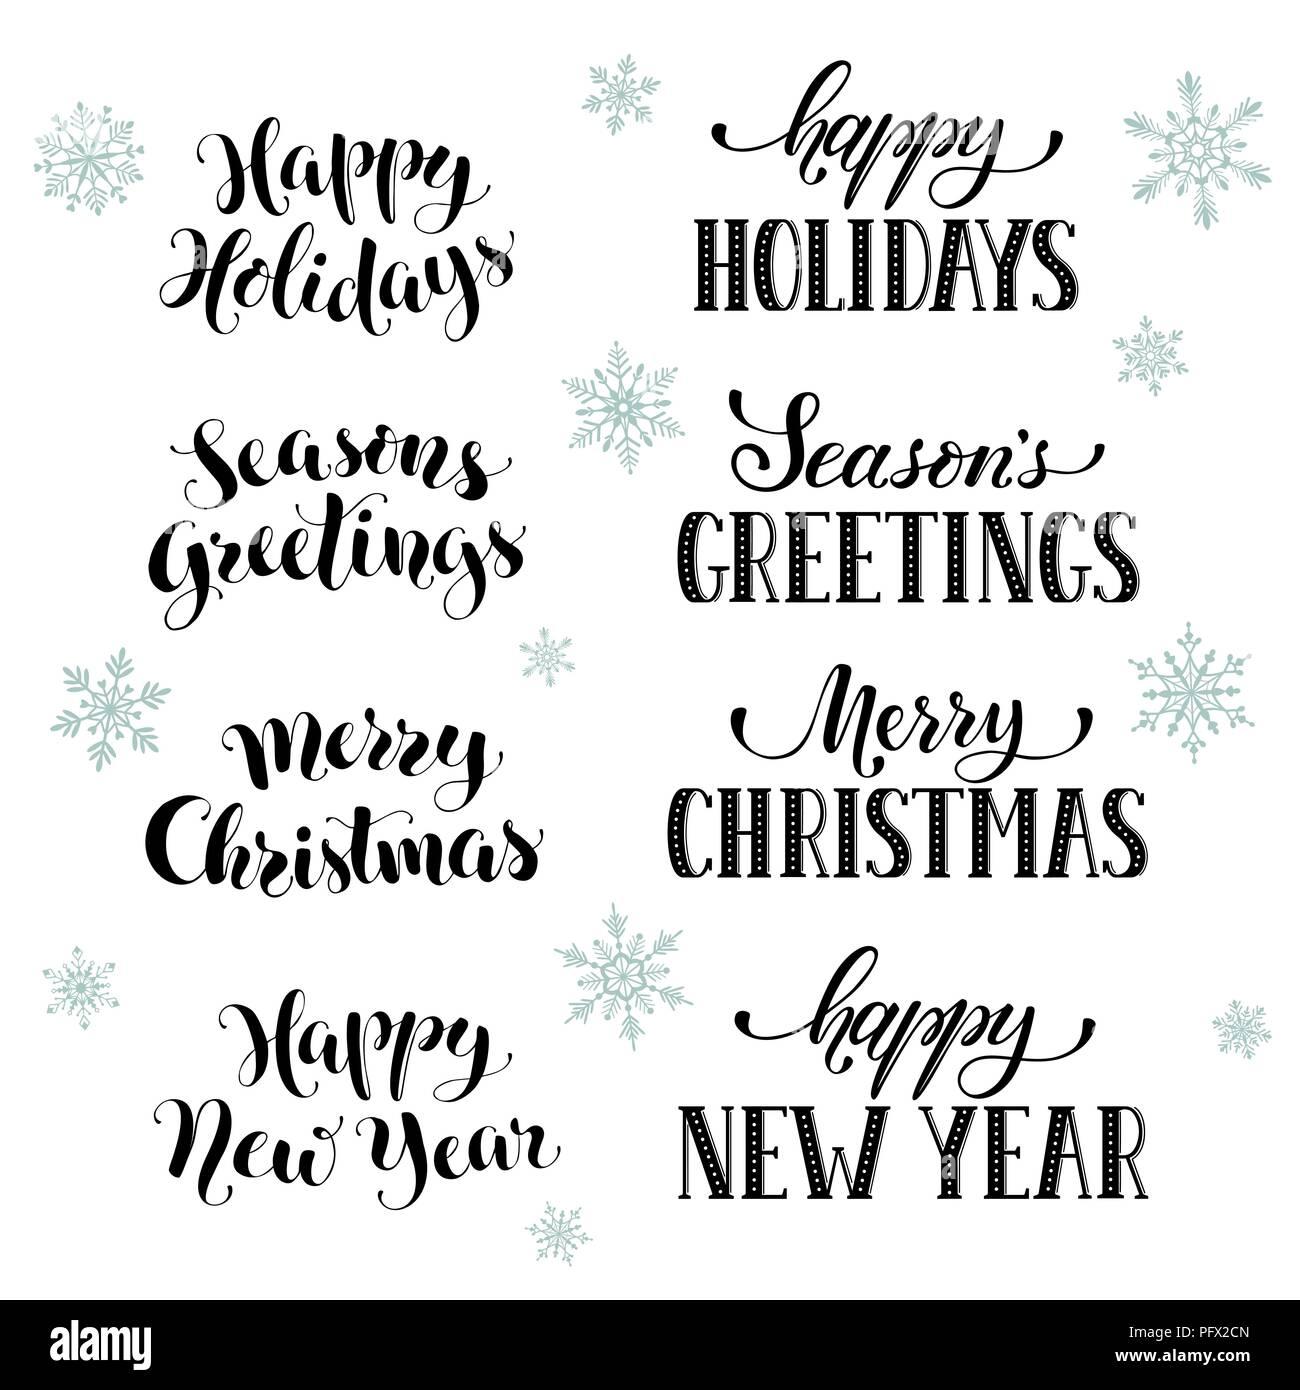 Happy Holidays Phrases Stock Vector Art Illustration Vector Image